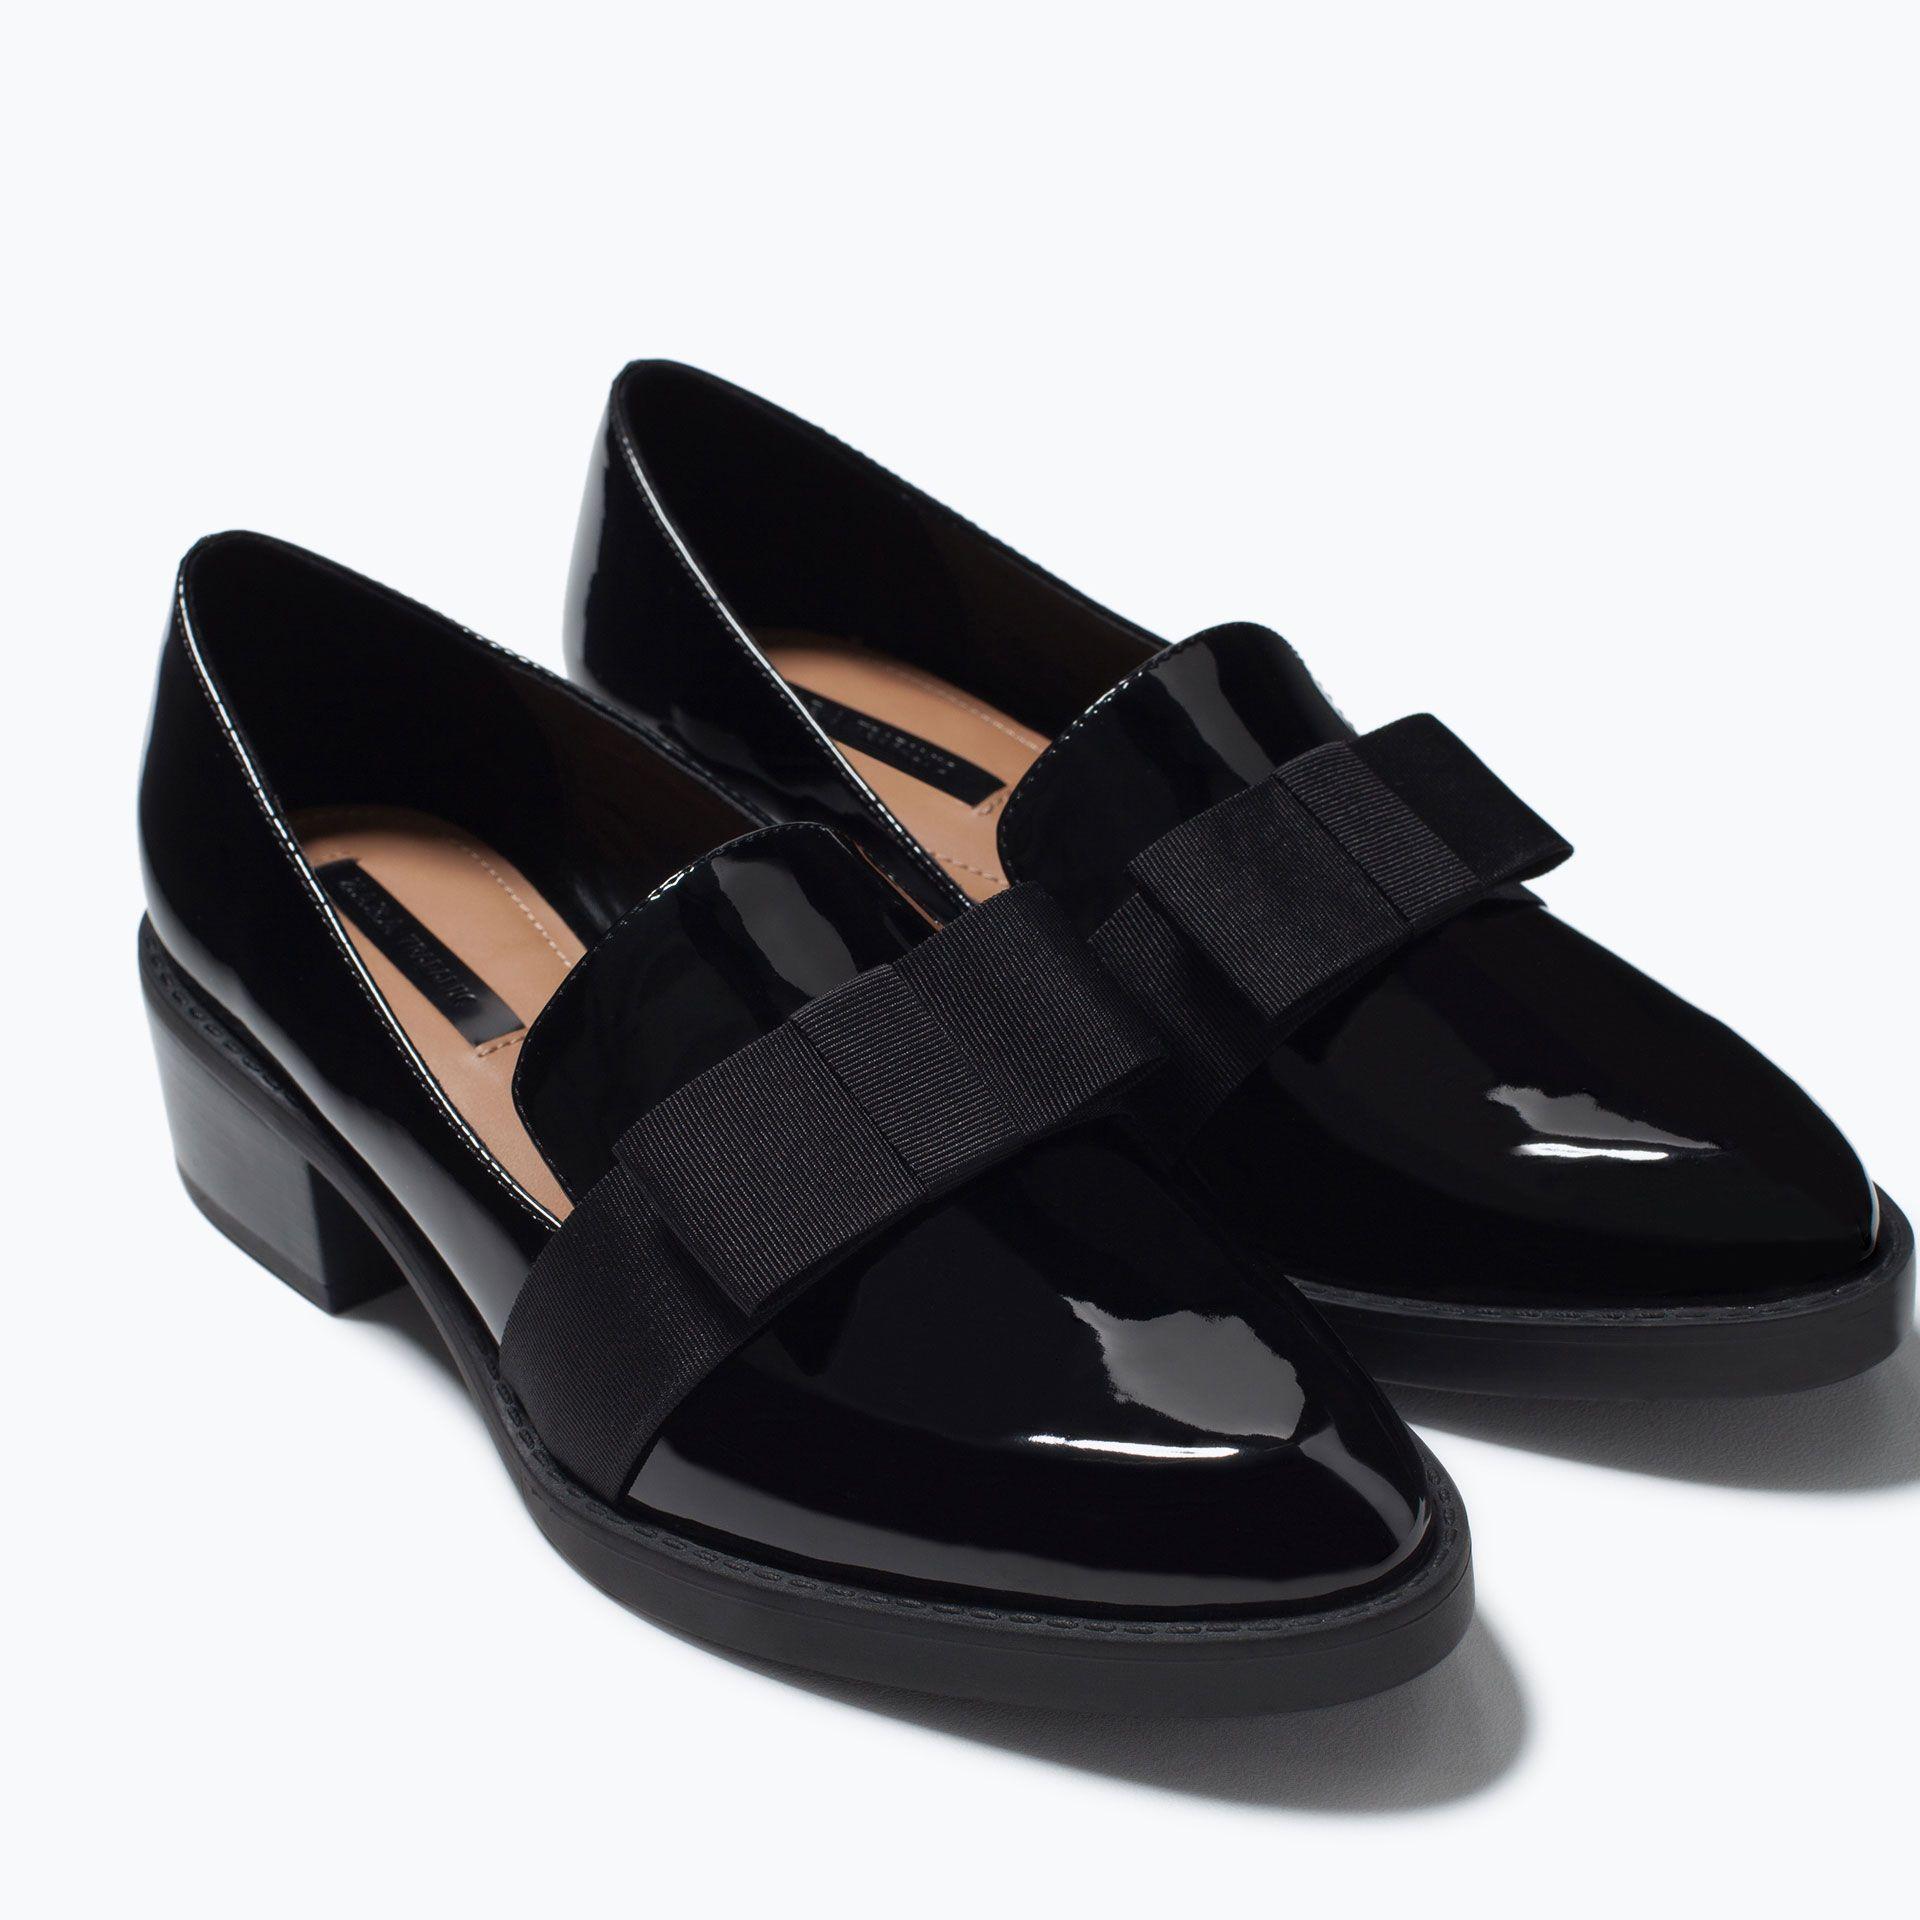 Zapatos negros formales Hip para mujer 0M2g7